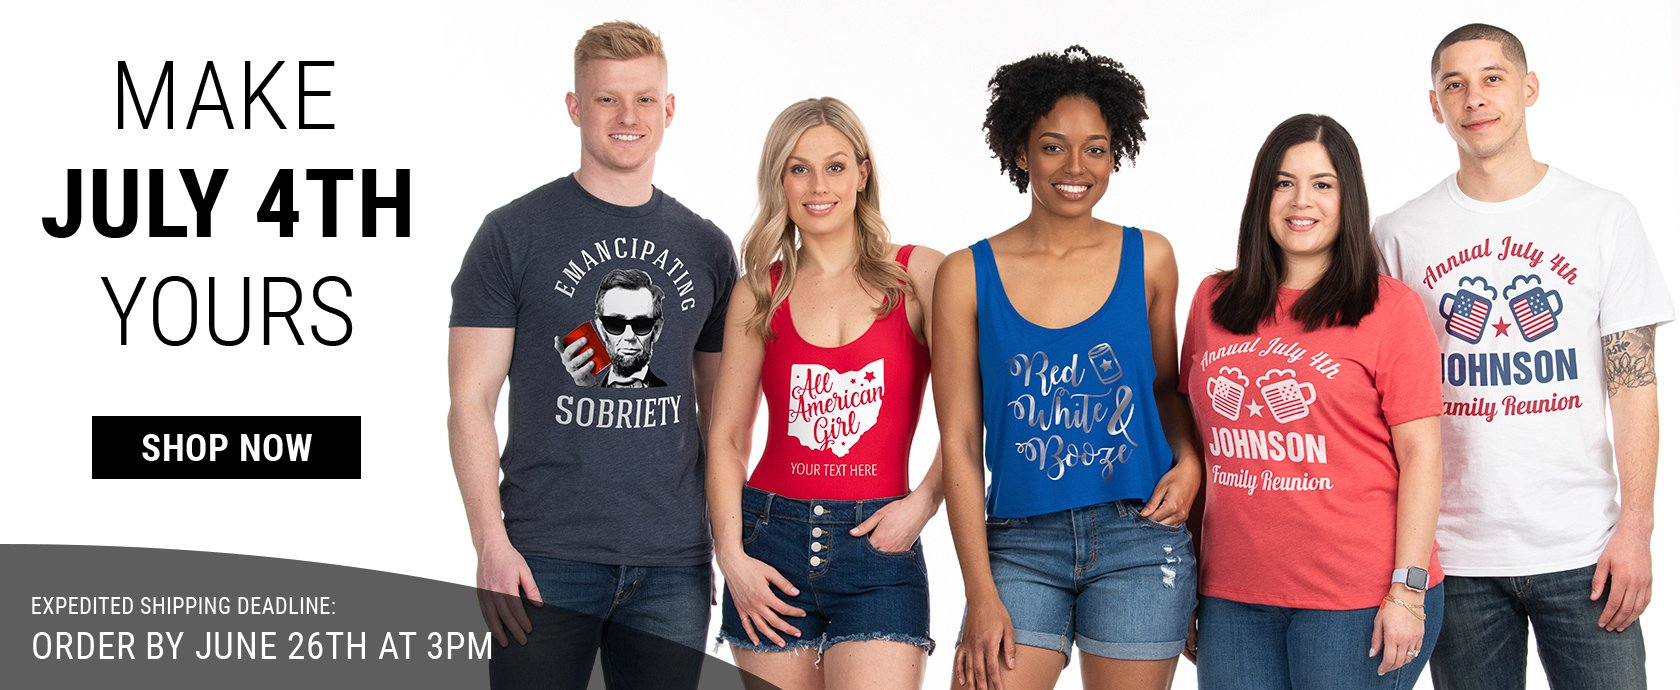 b344e2d34 Customized Girl - Custom Shirts, Tanks, Undies, & More